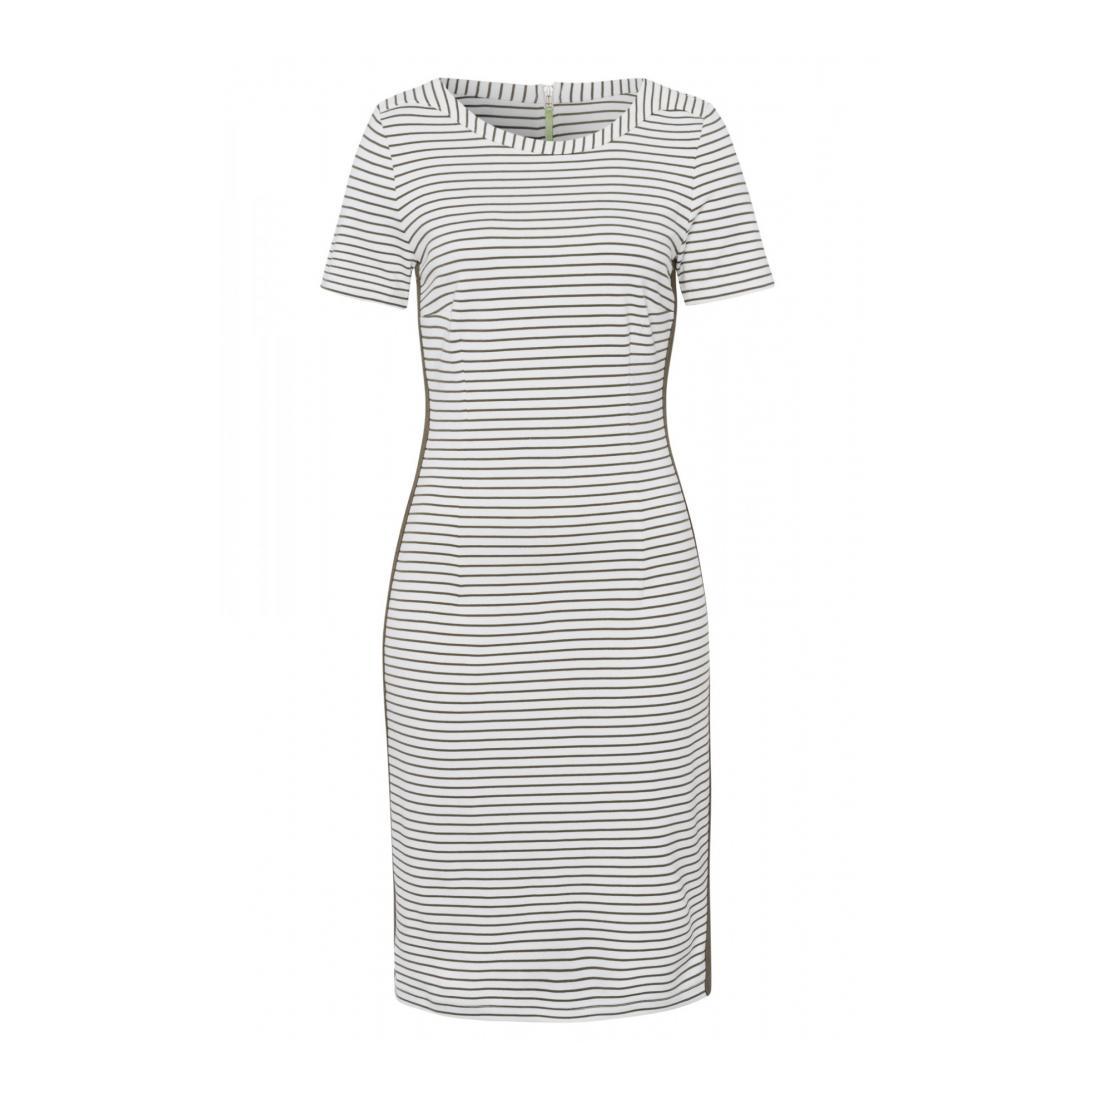 More & More Kleider kurz Damen Striped Jerseydress Activ